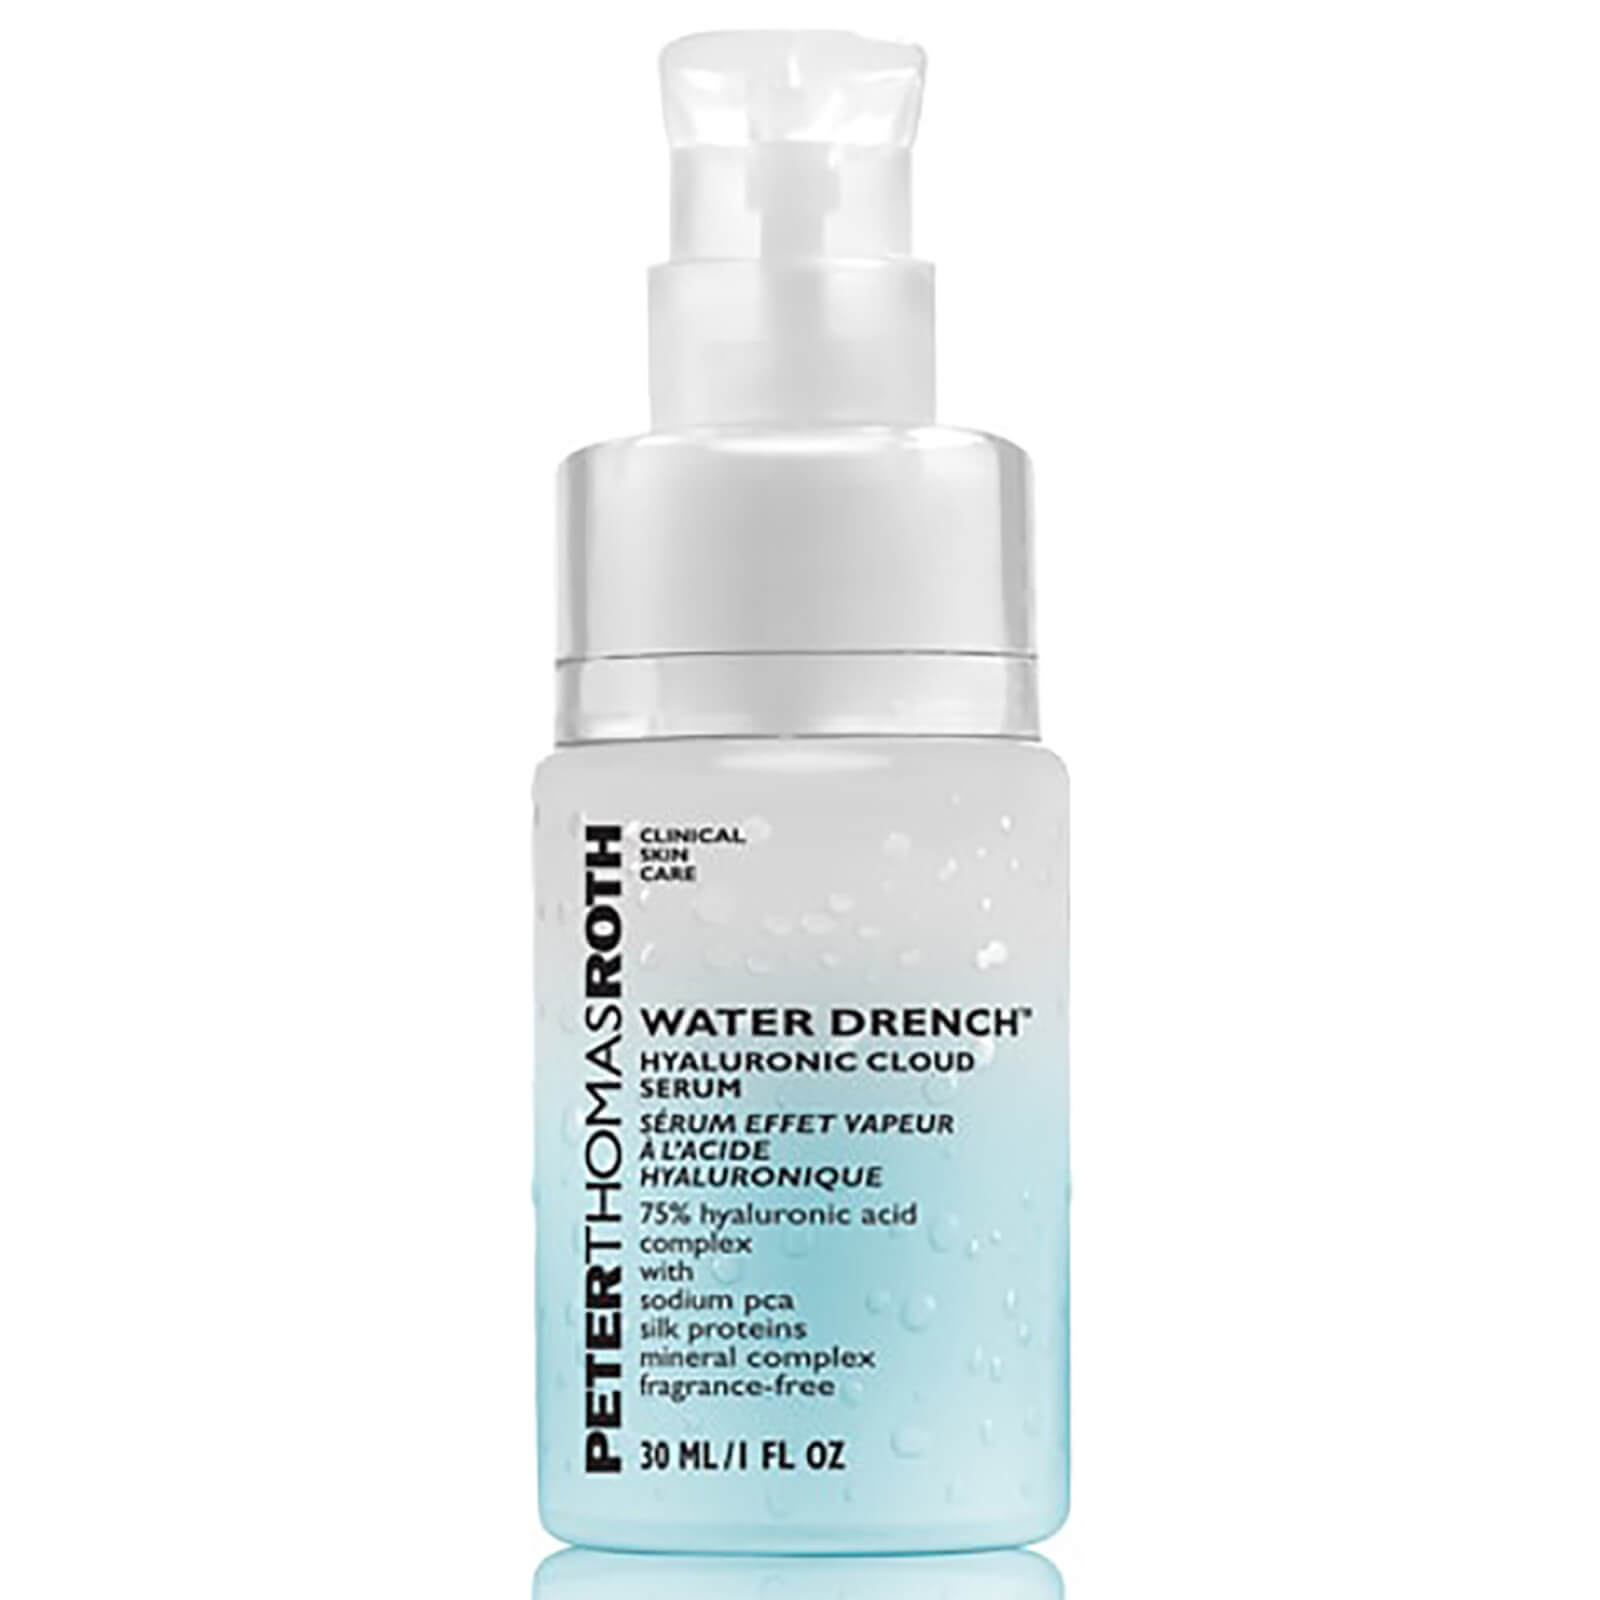 Купить Peter Thomas Roth Water Drench Hyaluronic Cloud Serum 1oz